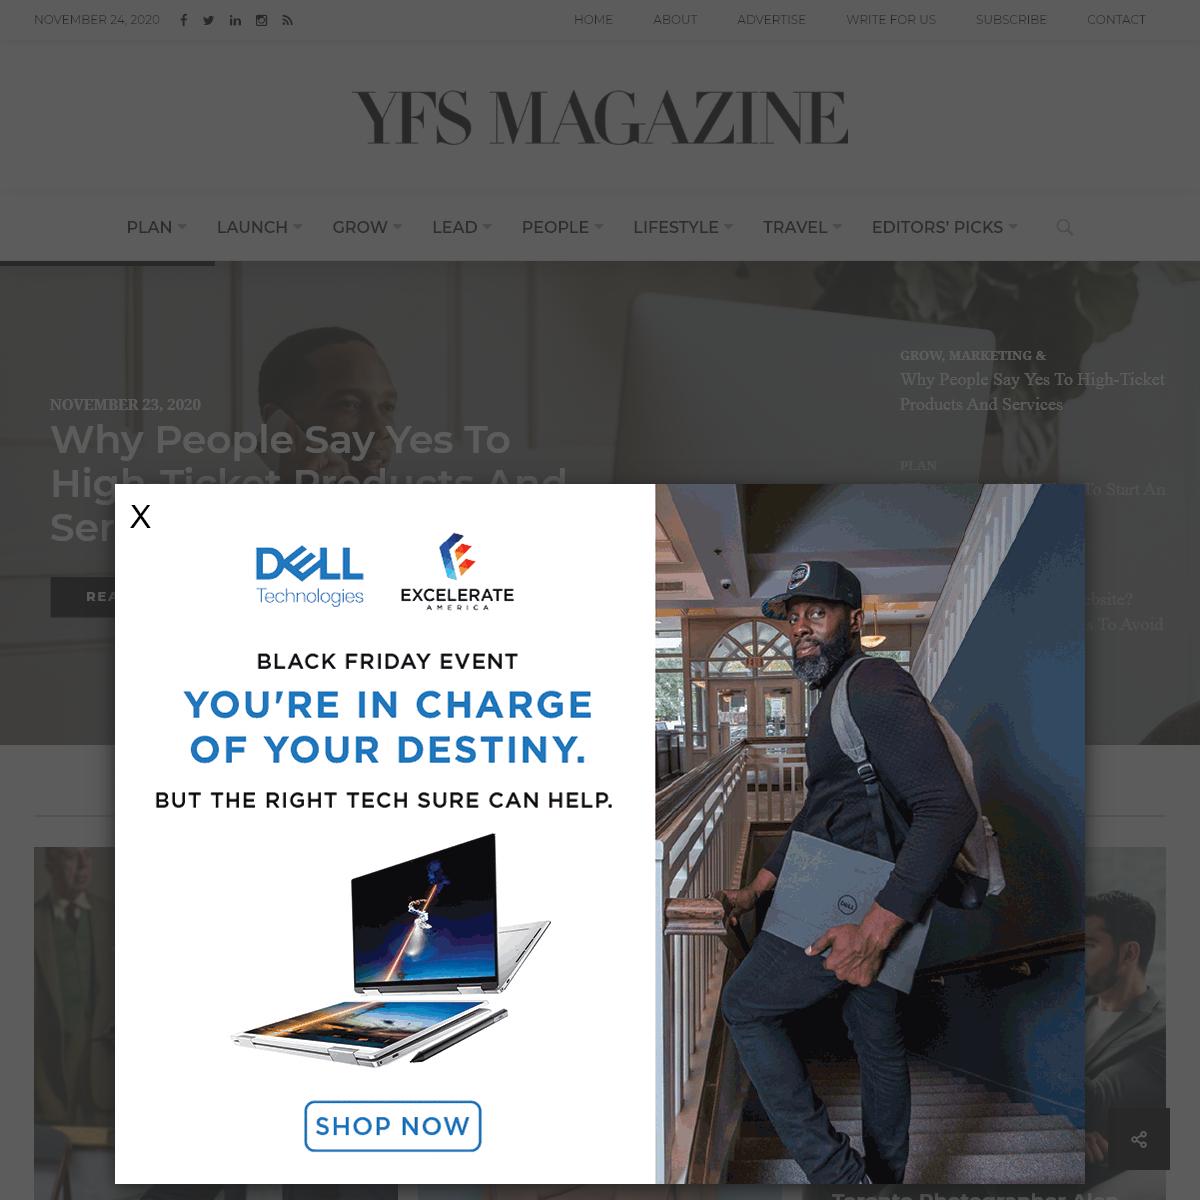 YFS Magazine – Young, Fabulous & Self-Employed